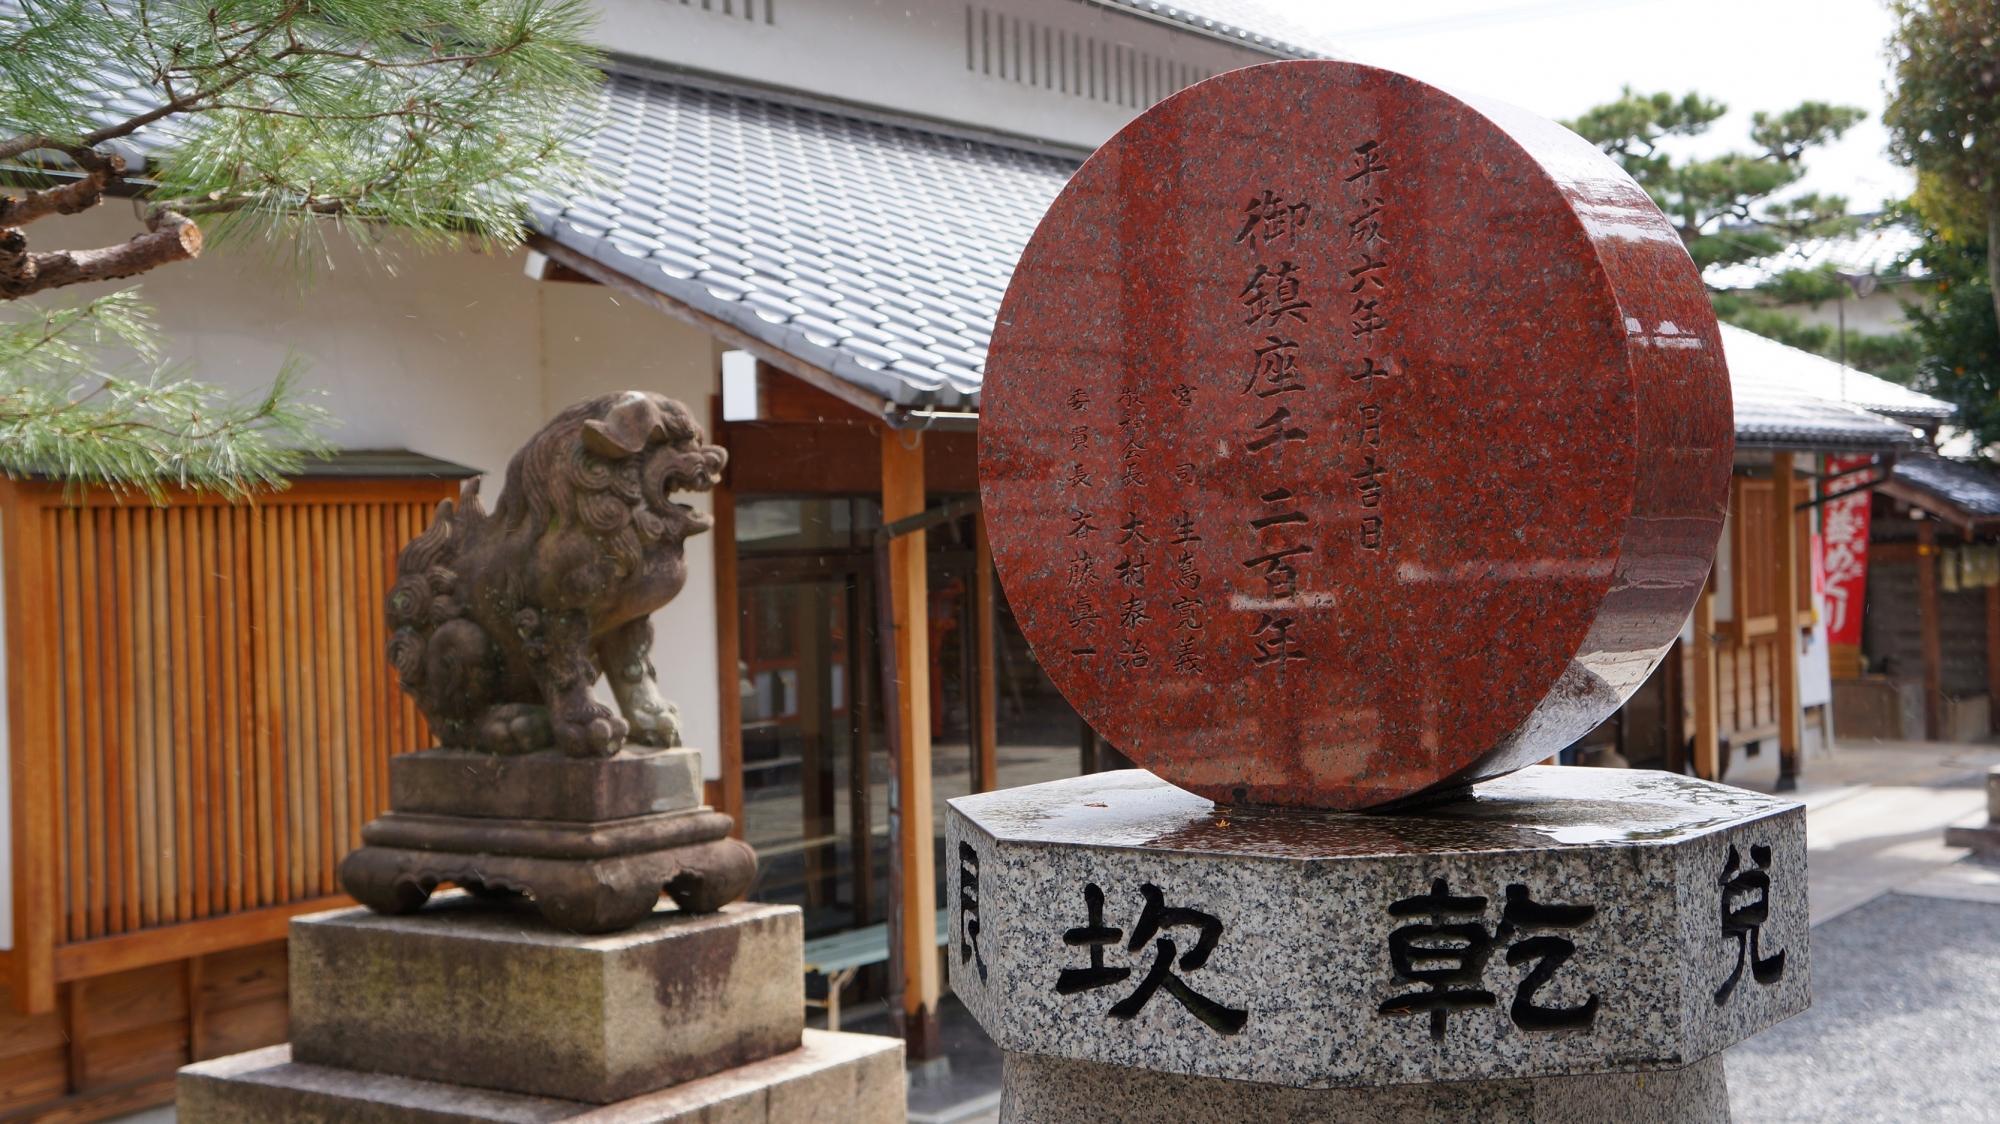 Daishogunhachi-jinja shrine Kyoto 方除け 星神 大将軍八神社 モニュメント